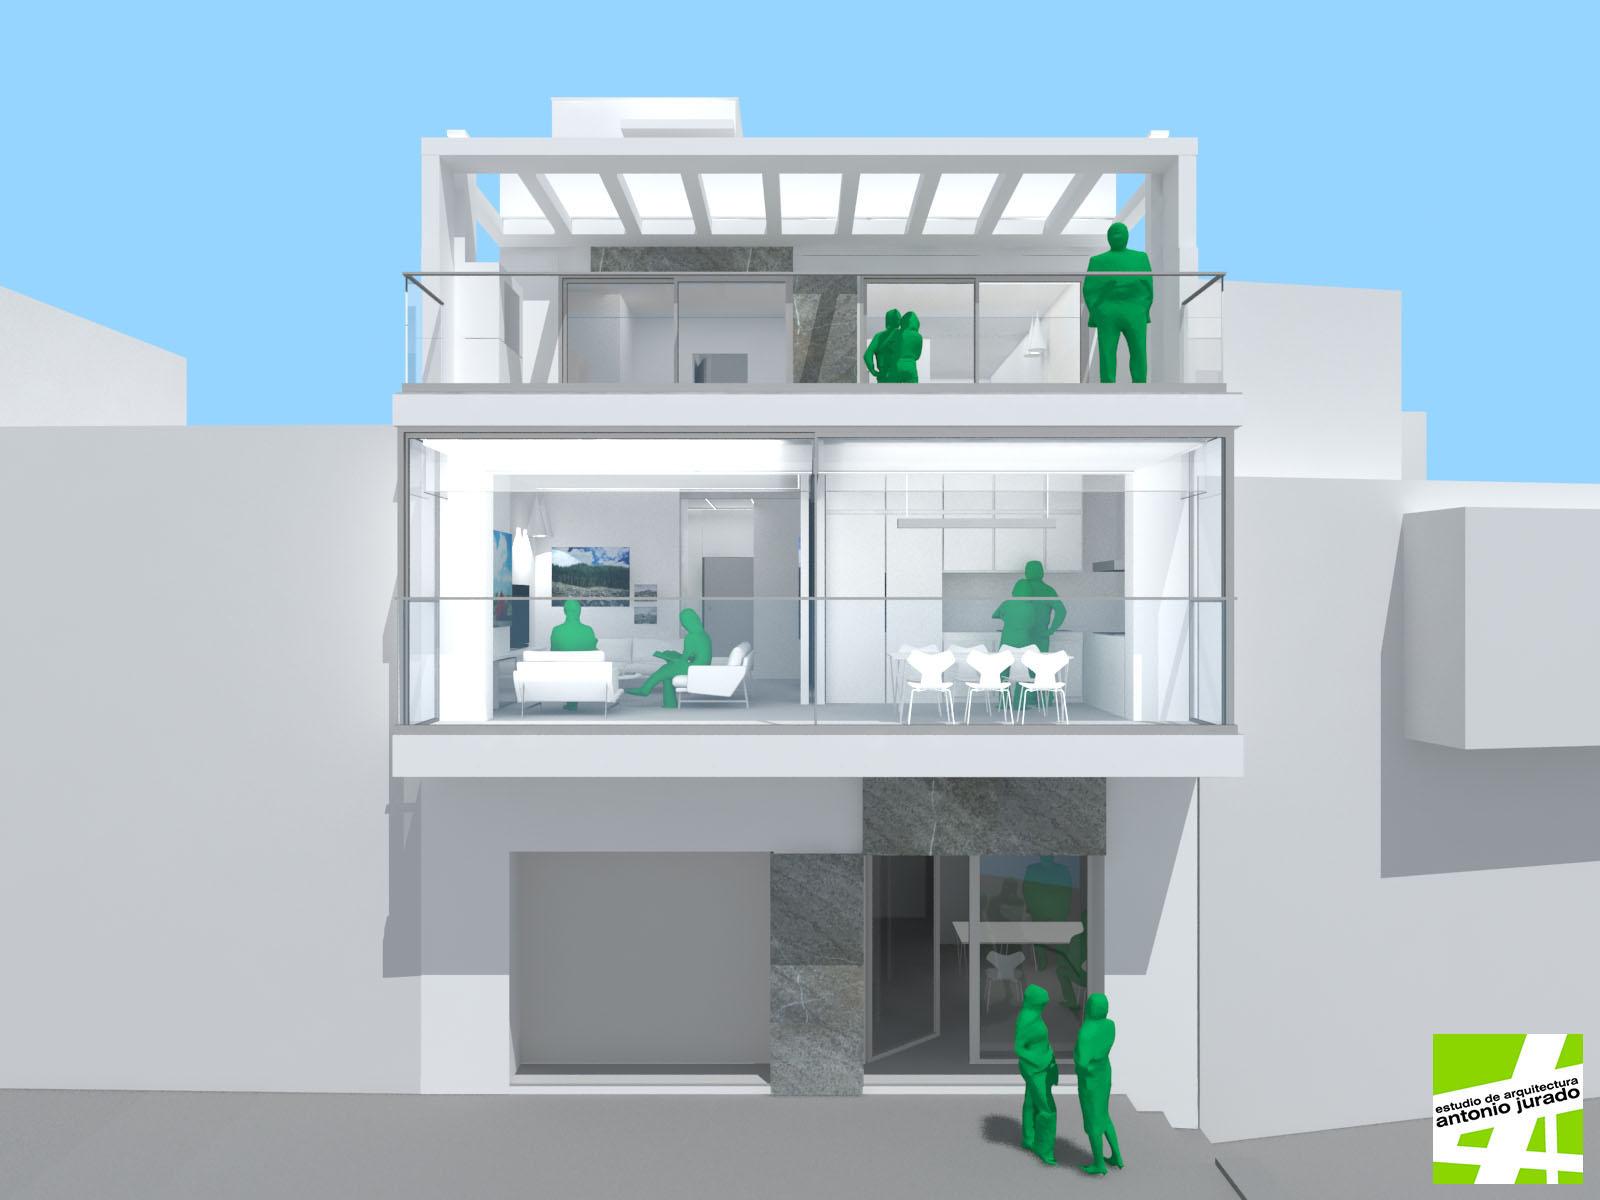 casa-ra-house-torrox-malaga-antonio-jurado-arquitecto-07